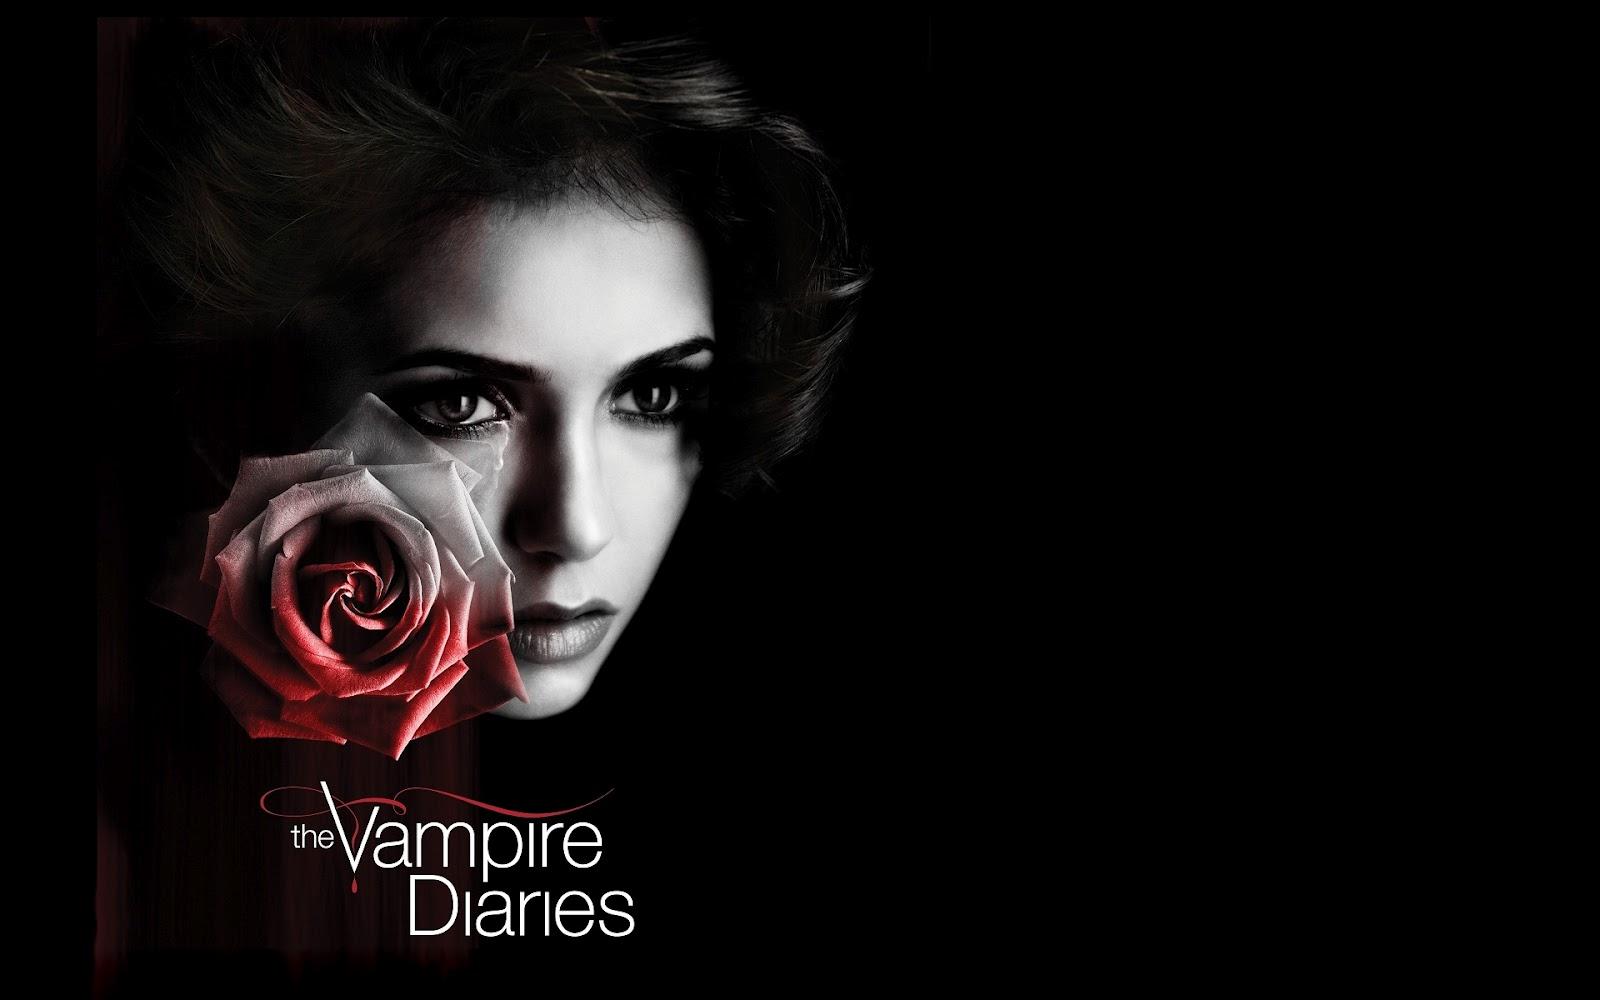 Vampire Diaries Wallpaper 12156 1600x1000 px ...